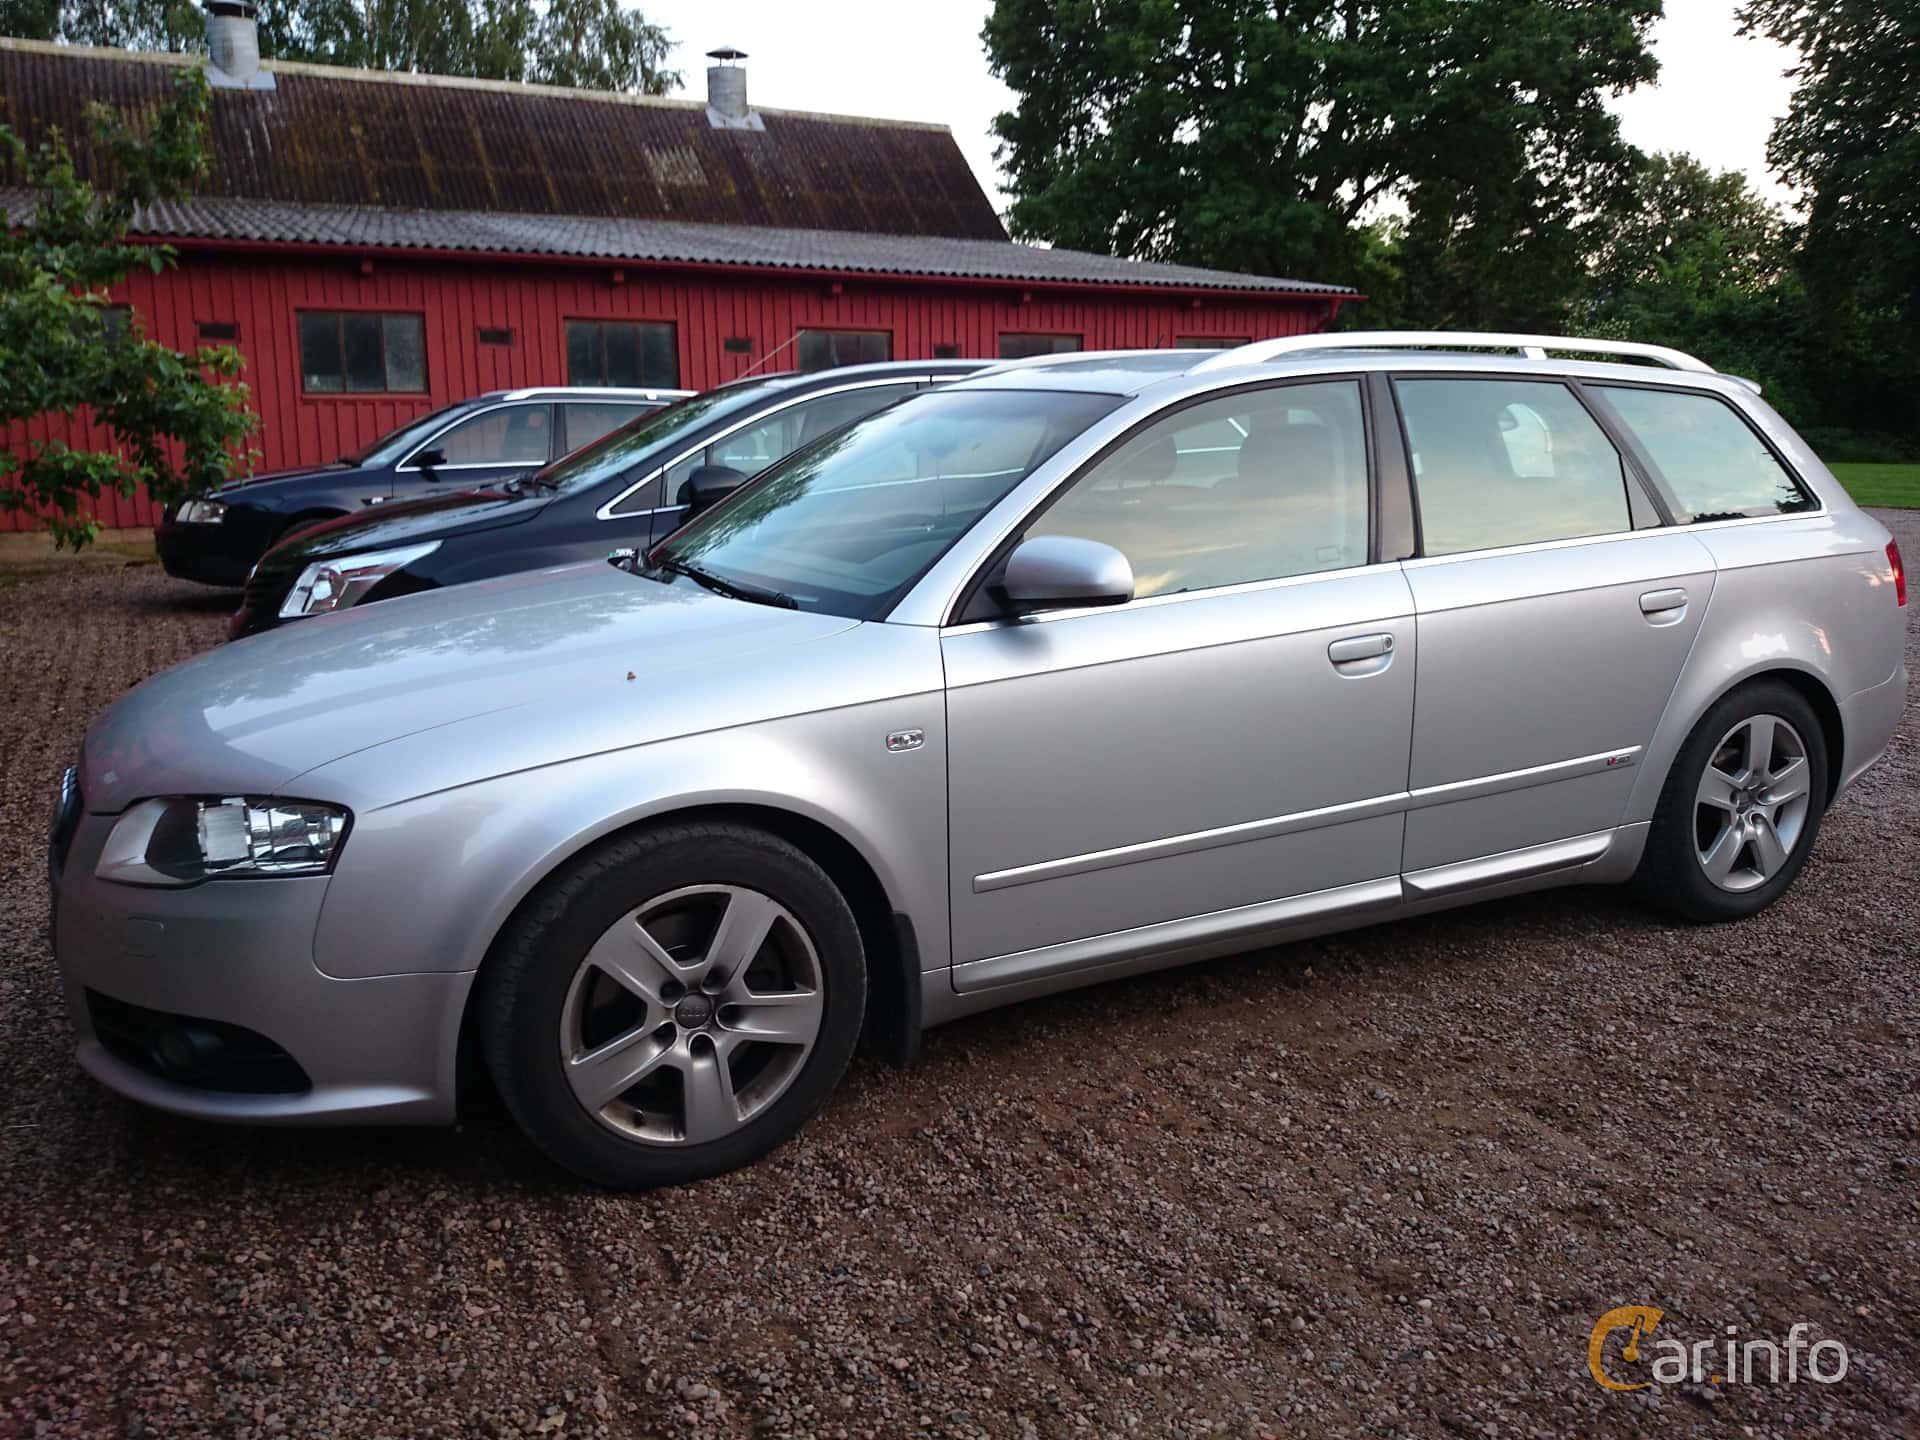 Audi 2 0 T >> Audi A4 Avant 1.8 T Manual, 163hp, 2007